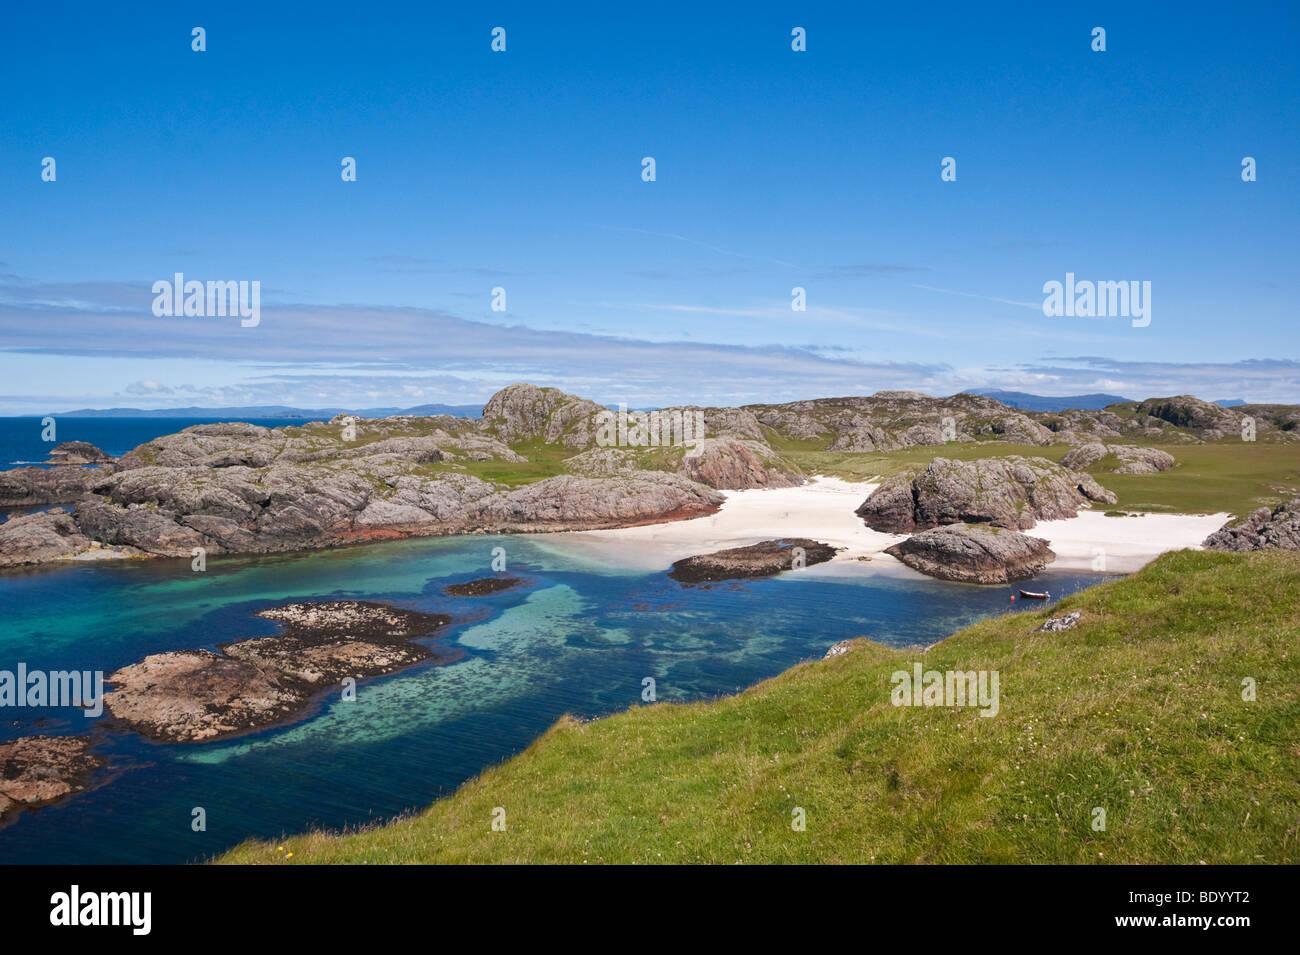 Isle of Iona Scotland - summer rocks sea and sand Port Ban - Stock Image